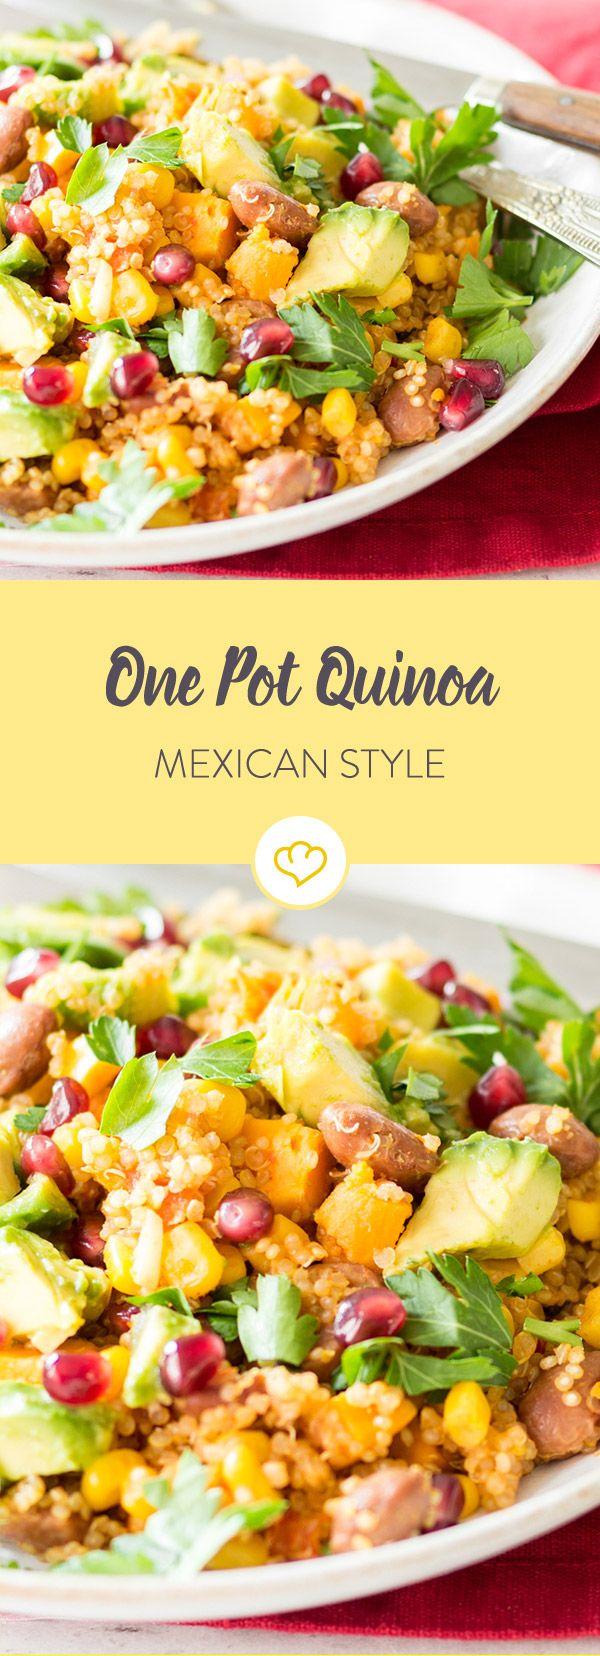 Quinoa-Rezepte: 47 leckere Ideen rund um den Sattmacher